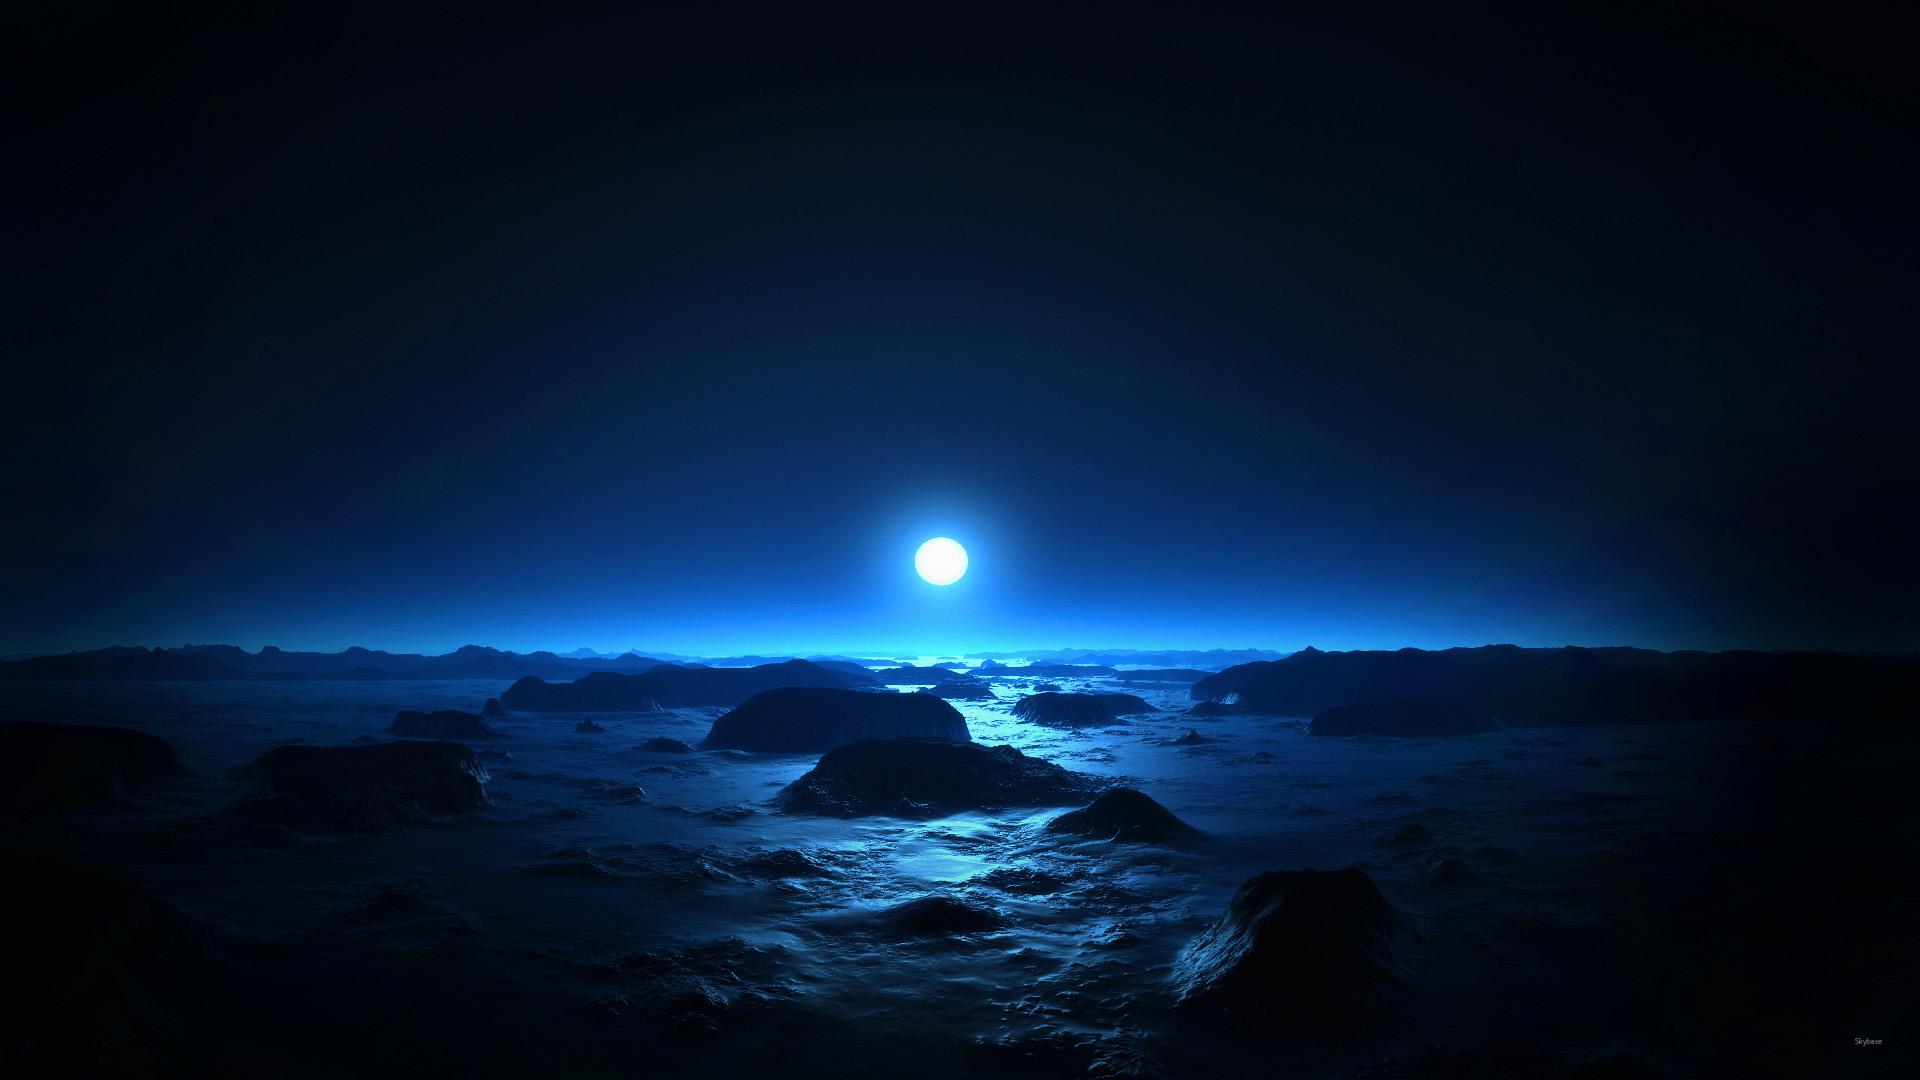 Moonlight Pic